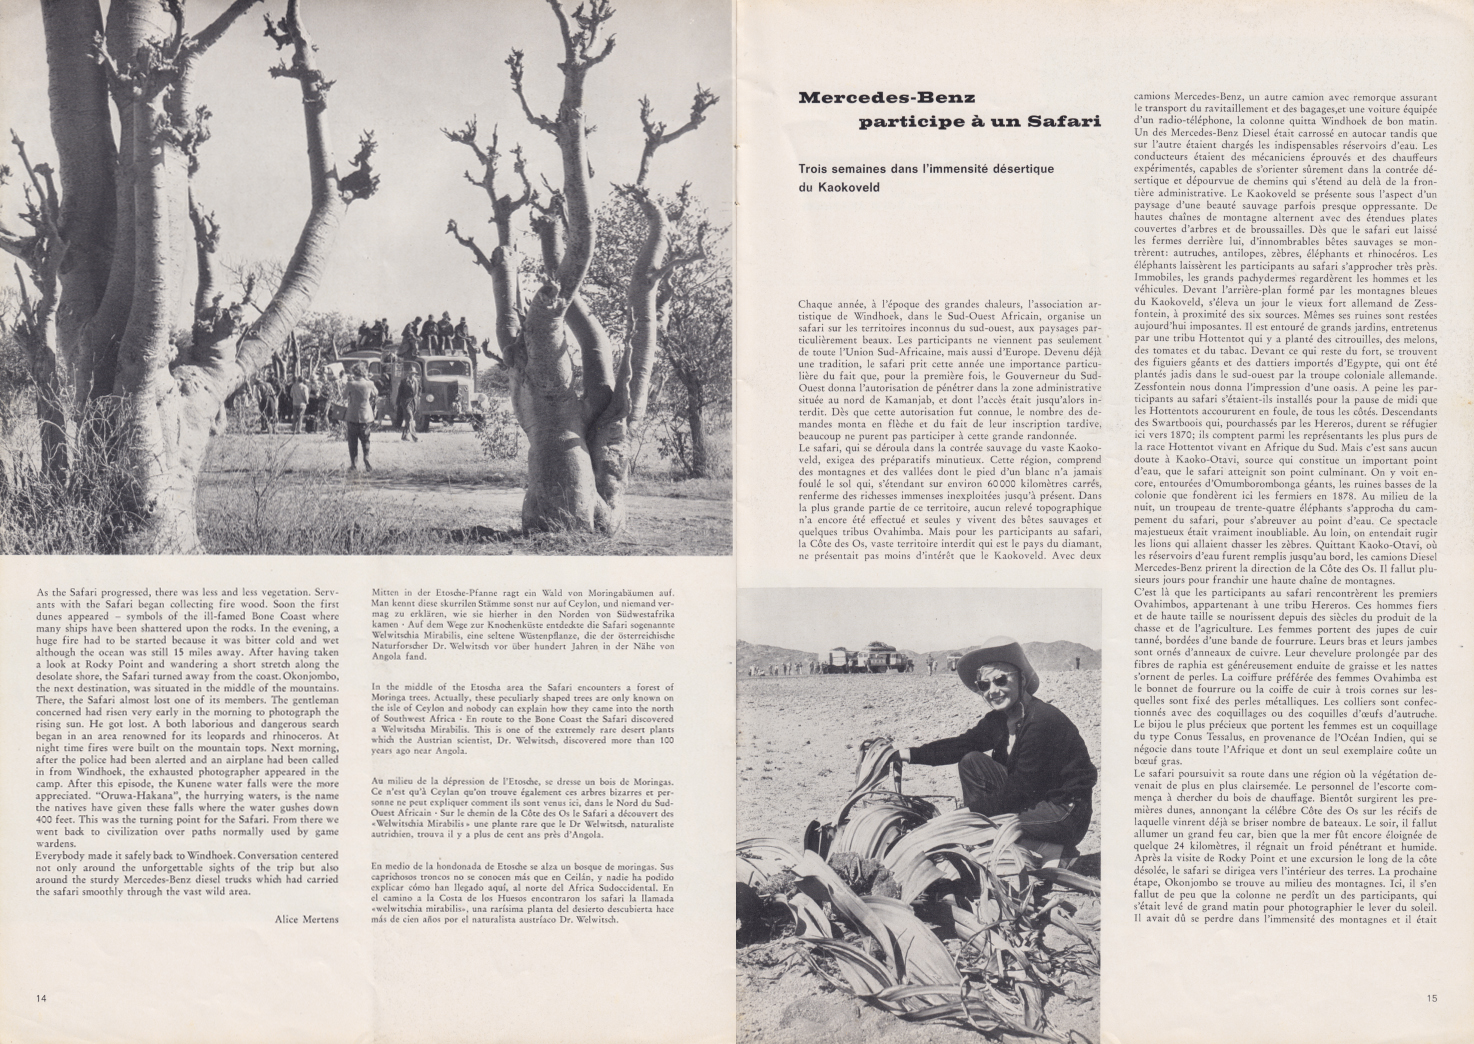 (REVISTA): Periódico In aller welt n.º 37 - Mercedes-Benz no mundo - 1959 - multilingue 008